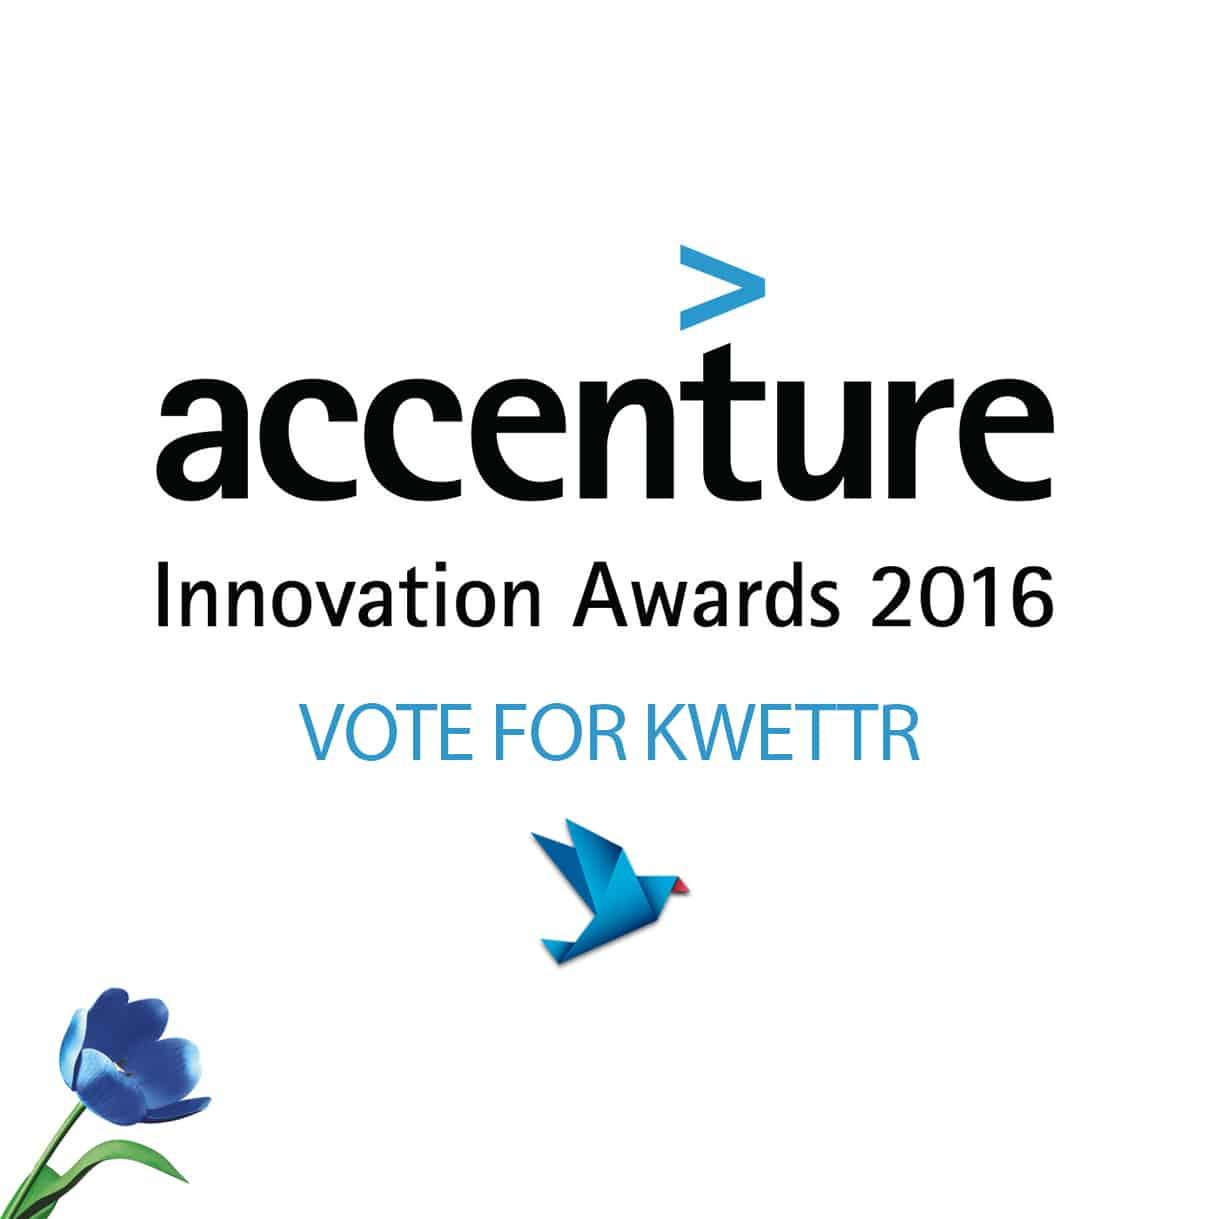 Vote for Kwettr